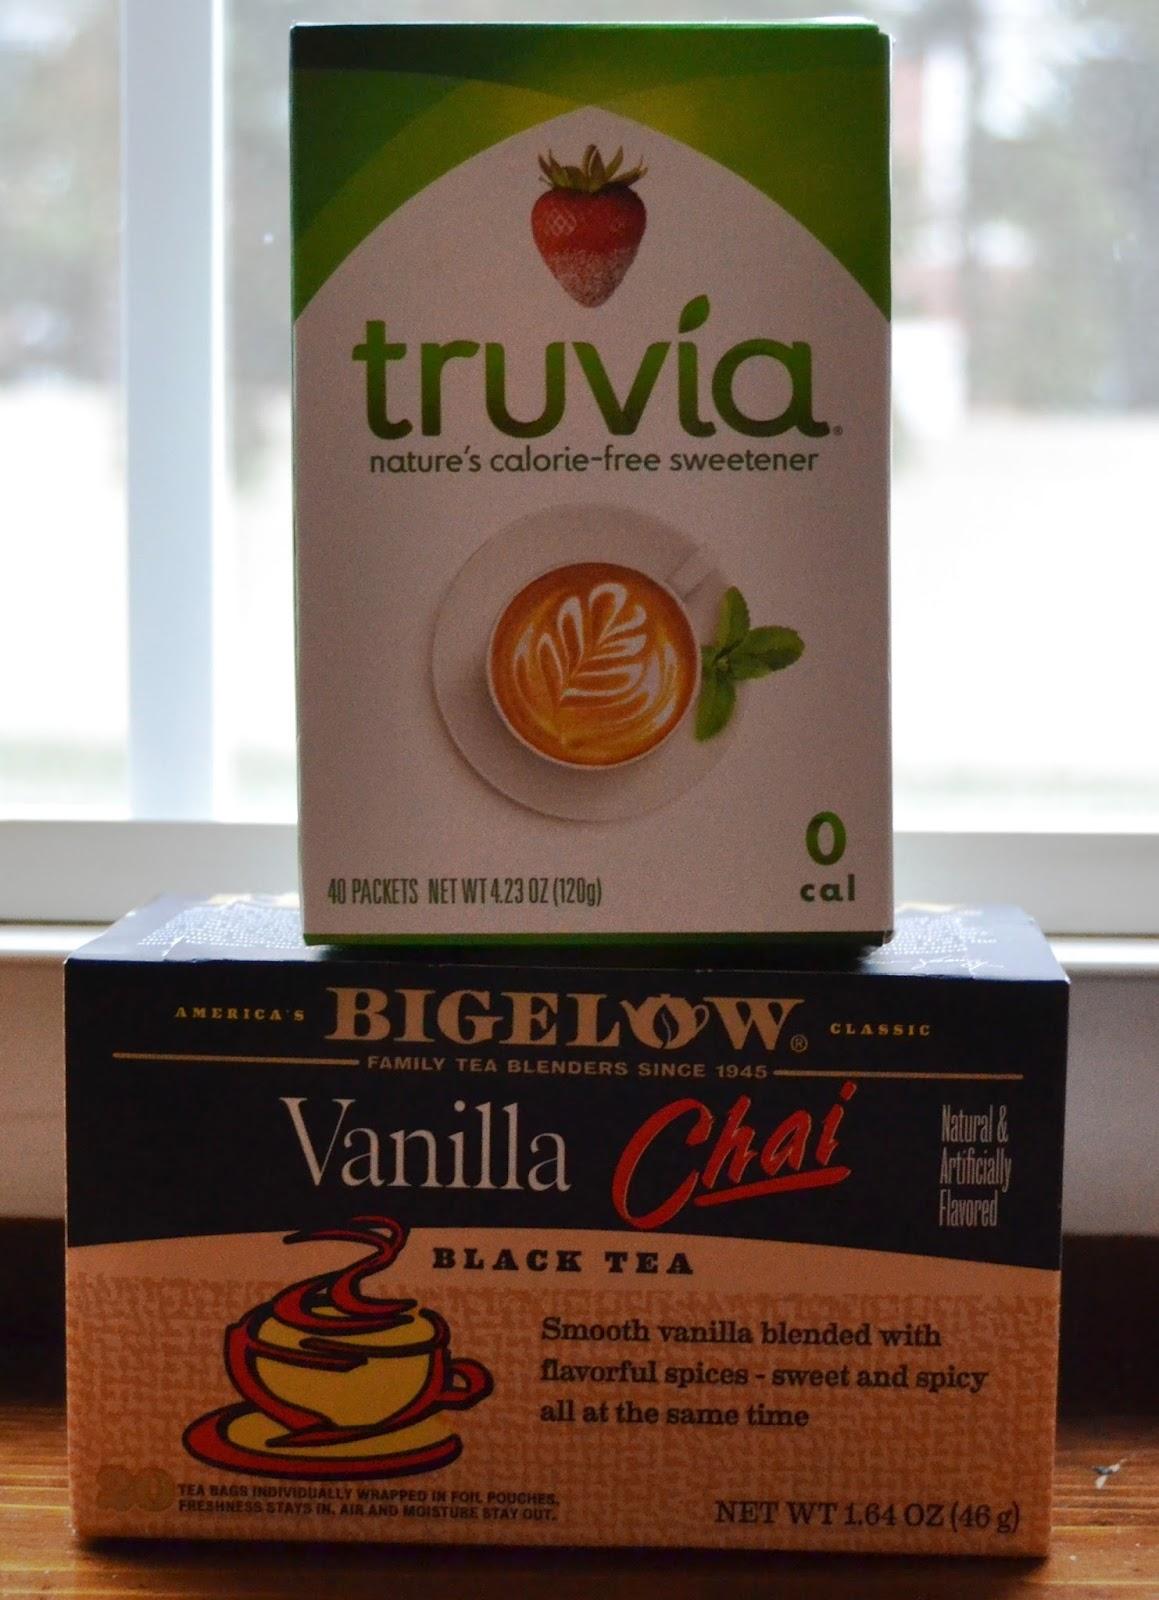 Bigelow Tea and Truvia